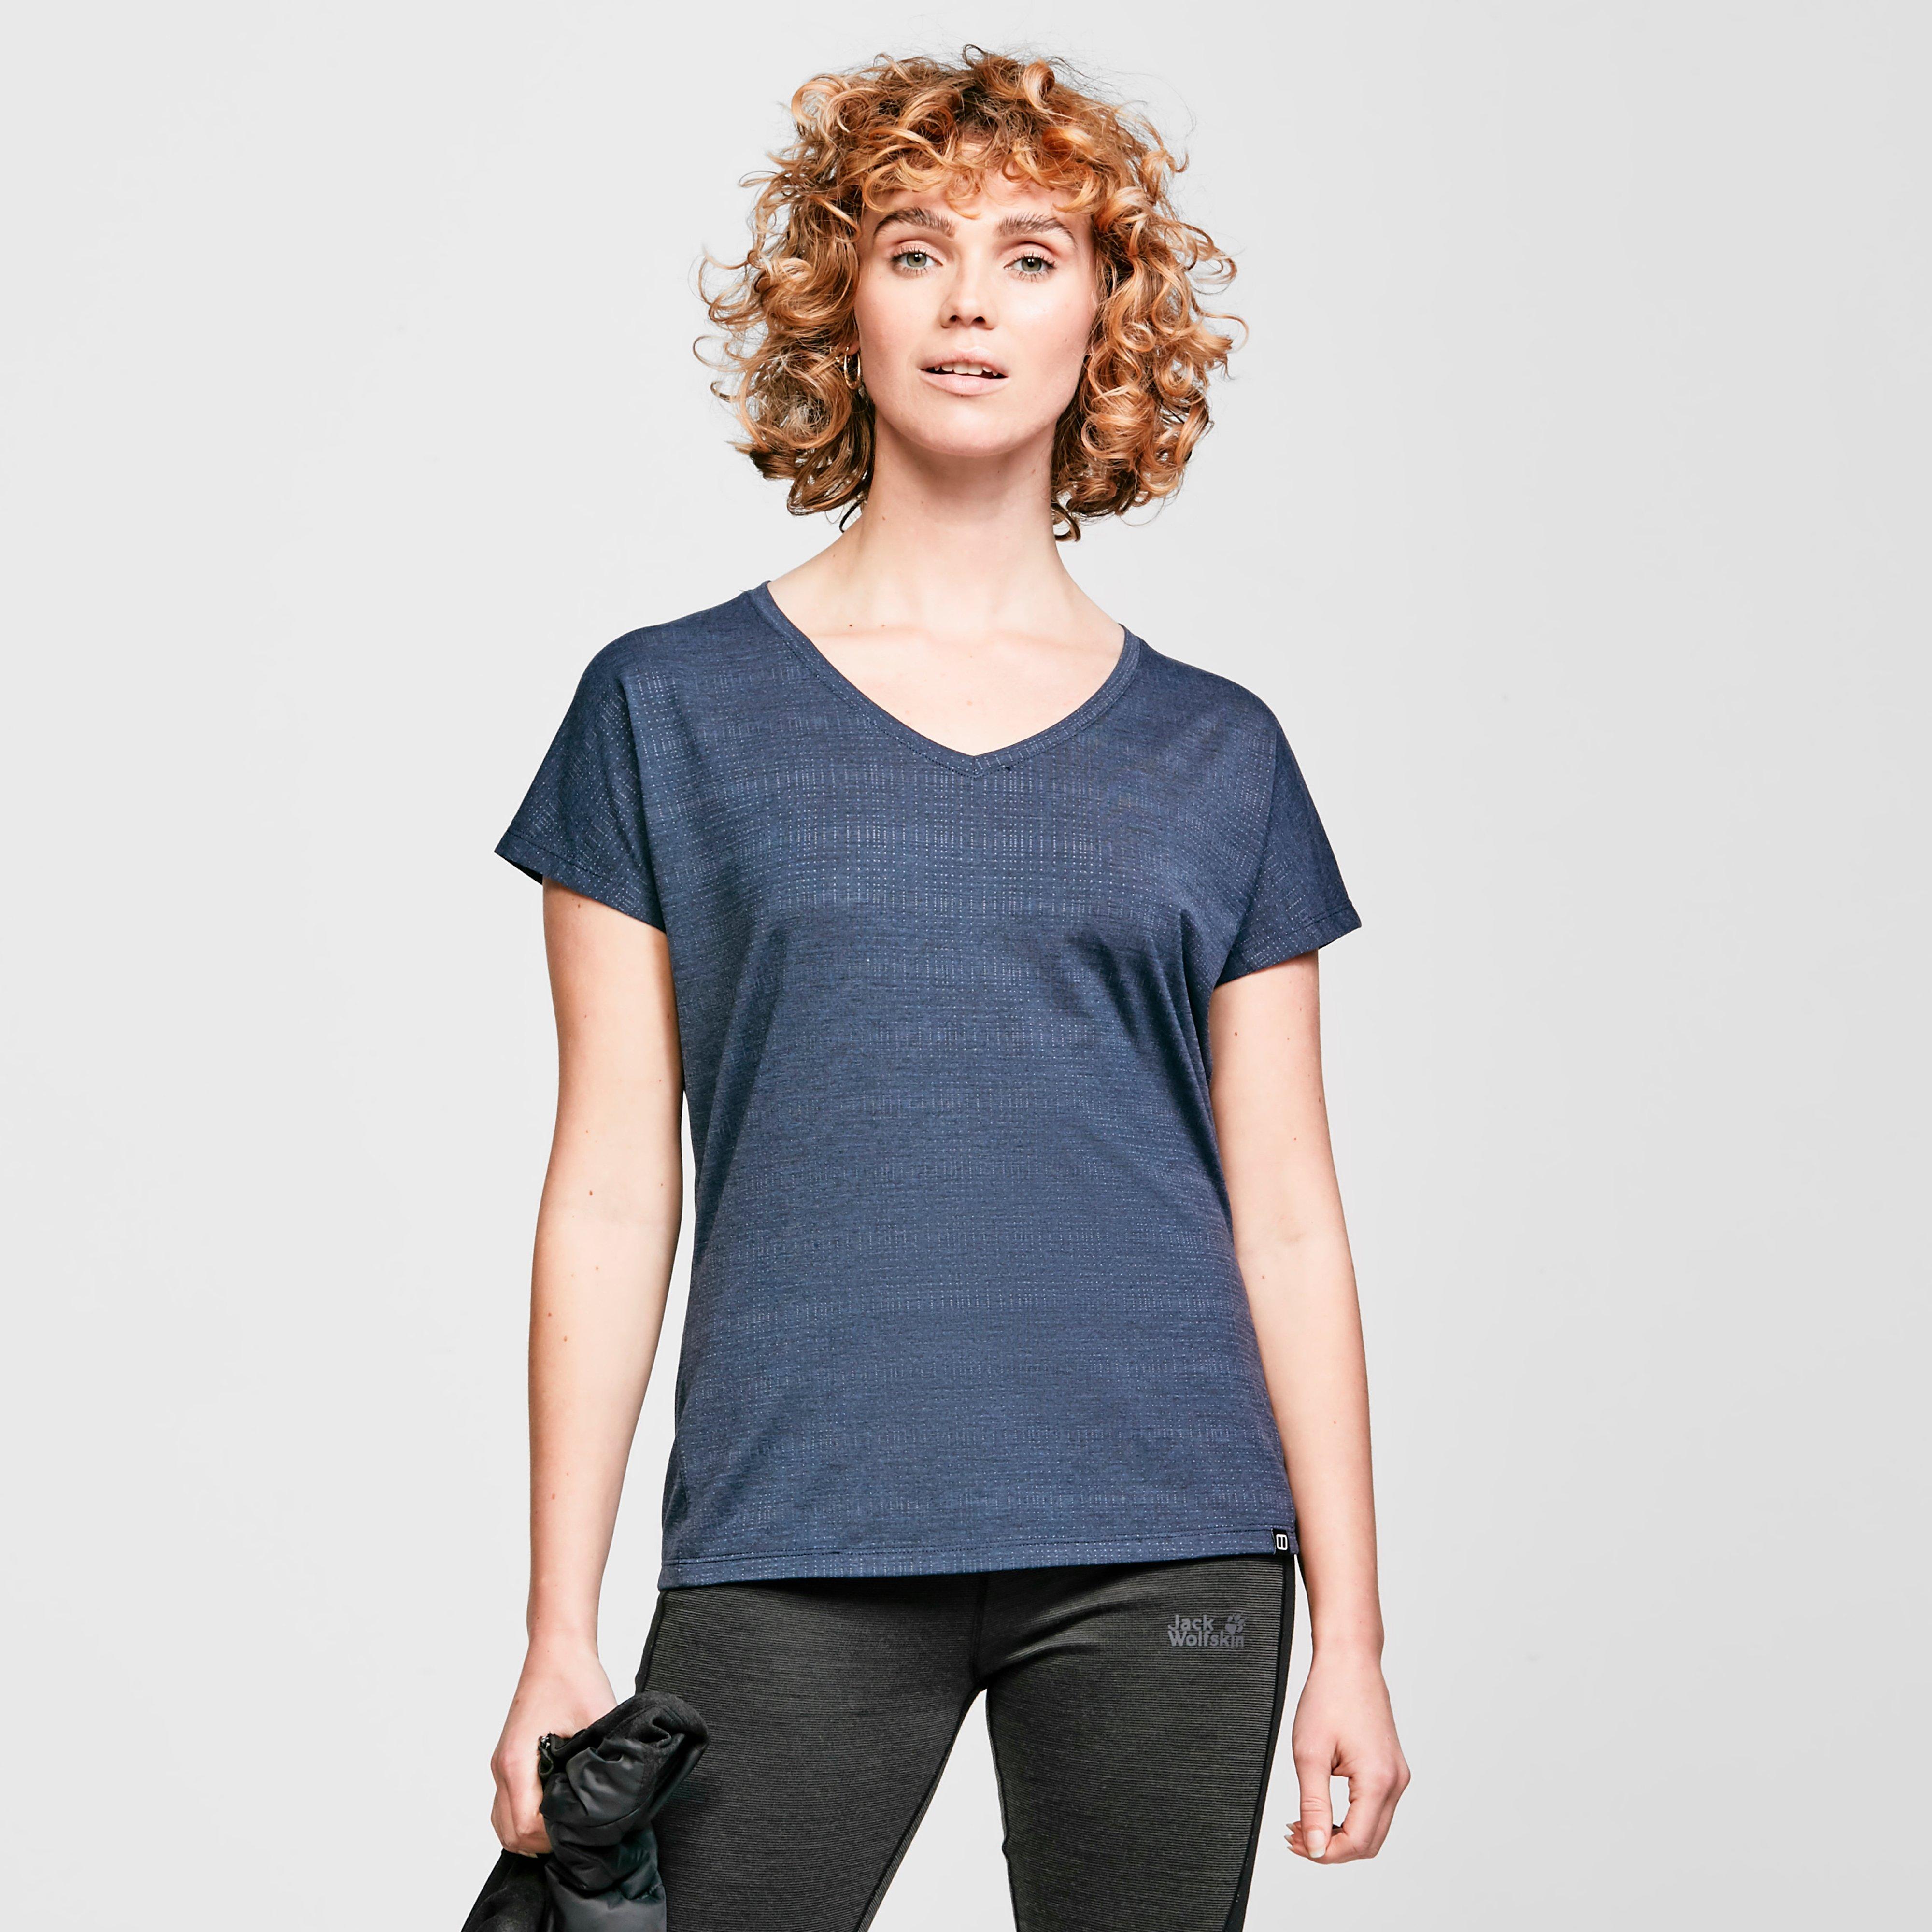 Berghaus Womens Optic Short-sleeve T-shirt - Navy/nvy  Navy/nvy